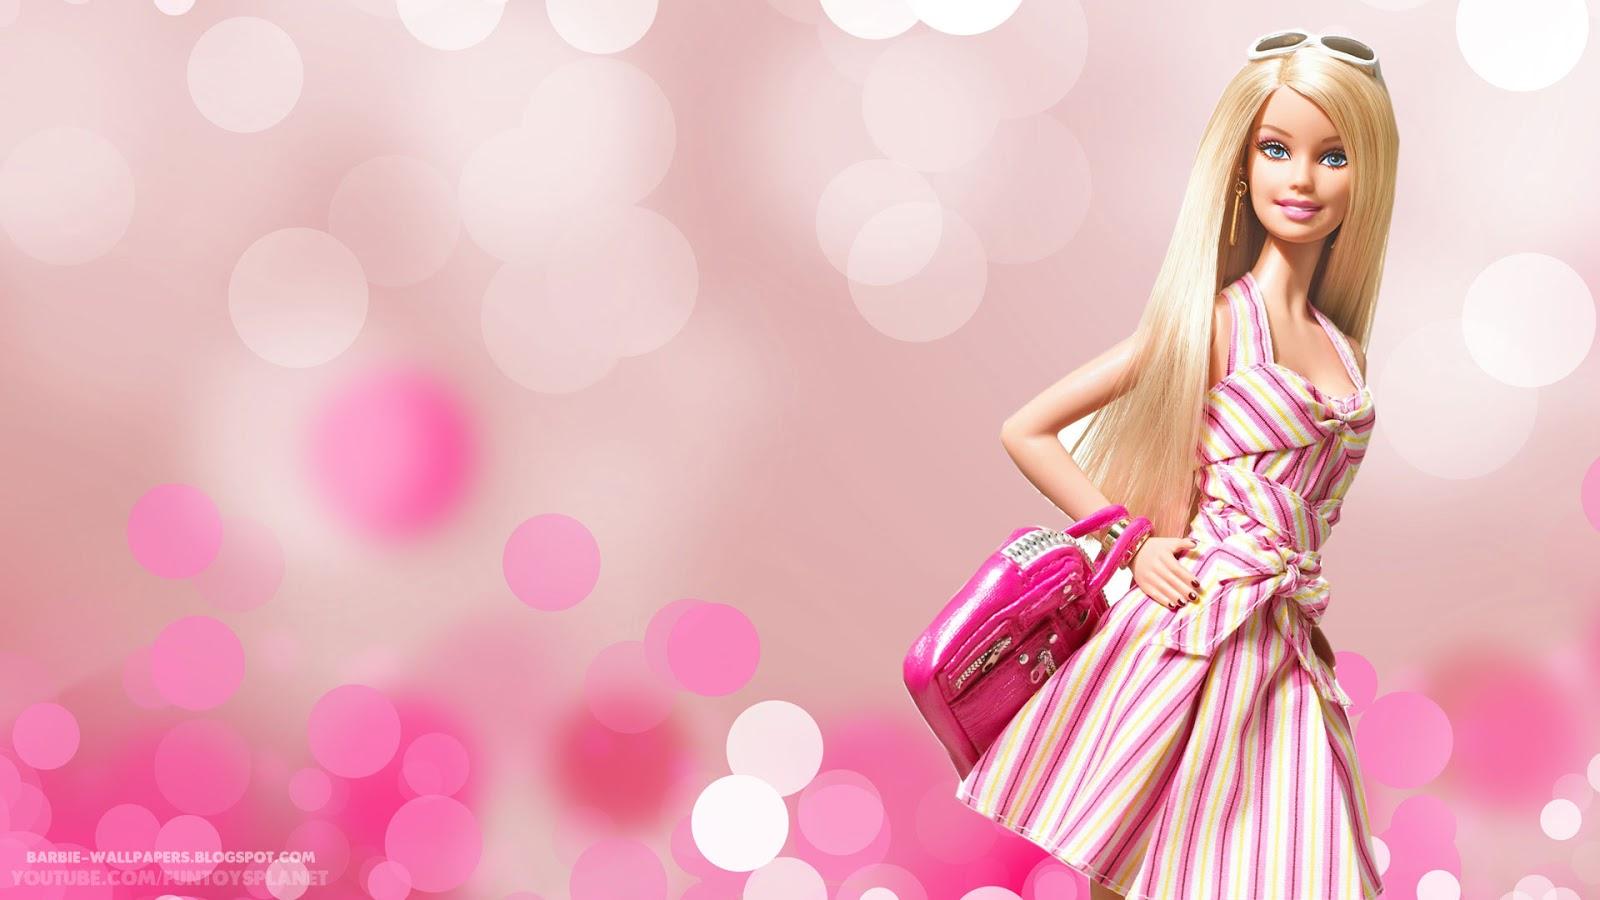 Barbie Wallpapers November 2015 1600x900